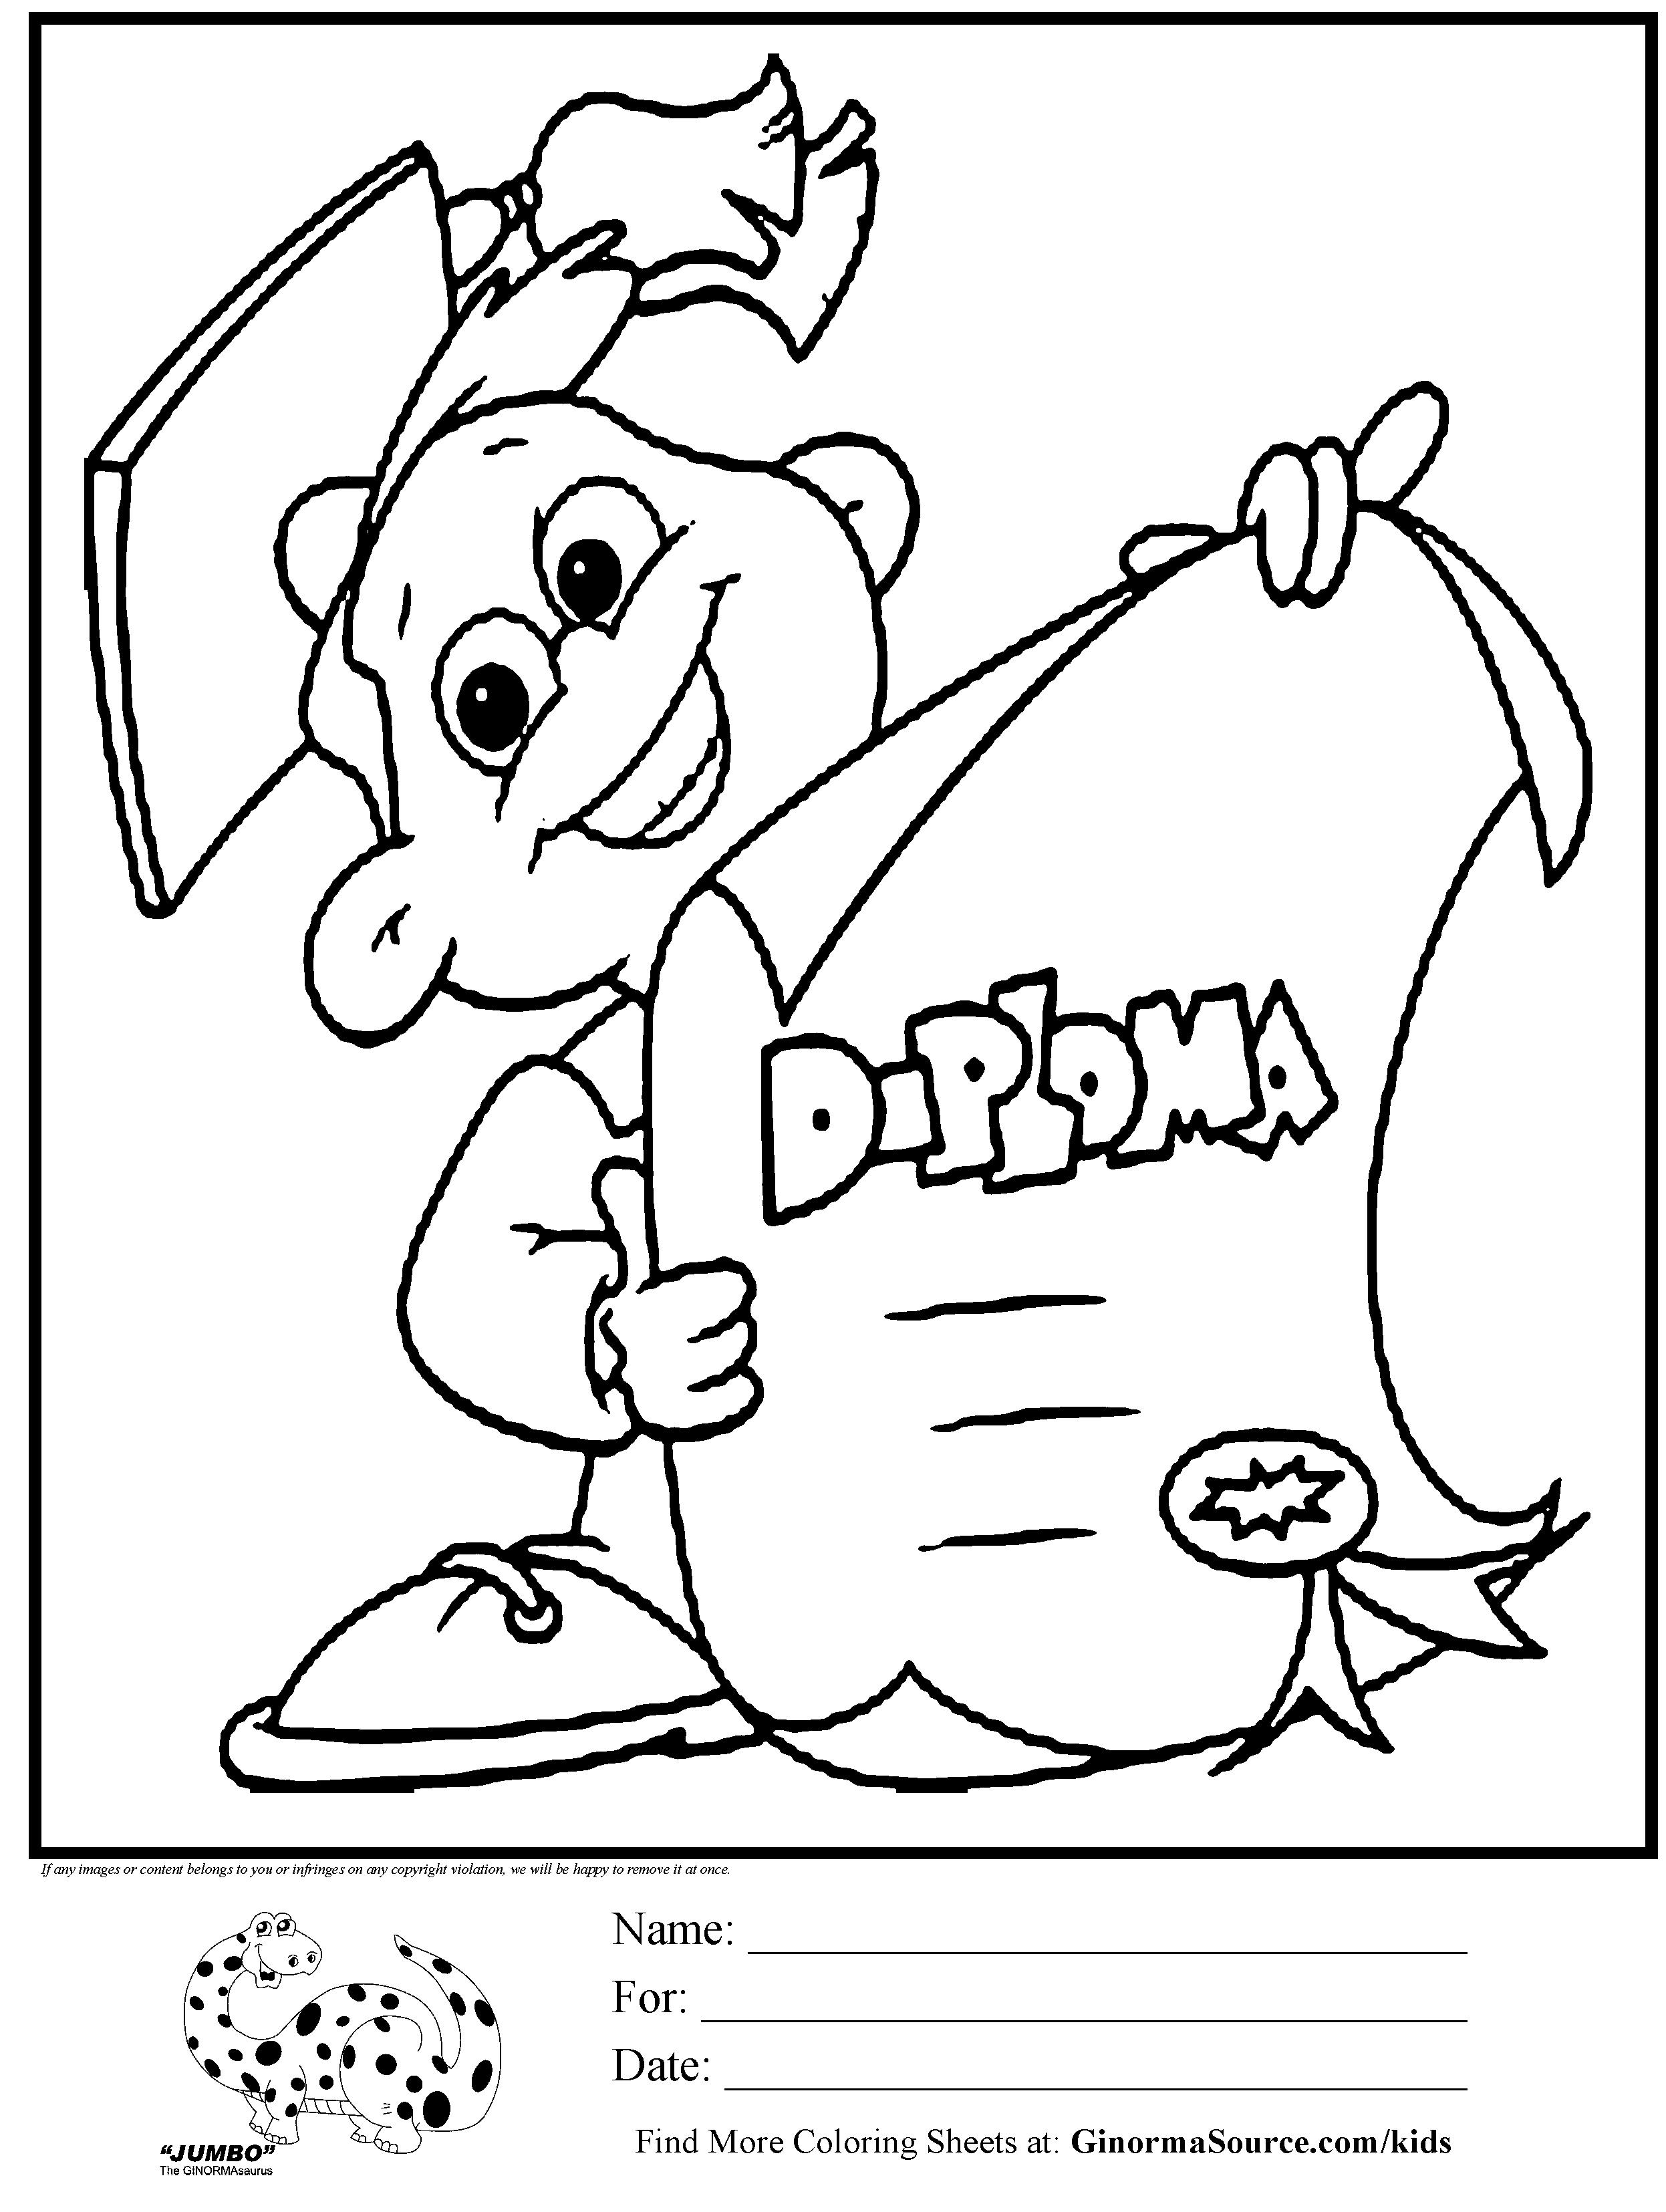 Kindergarten Diploma Coloring Page